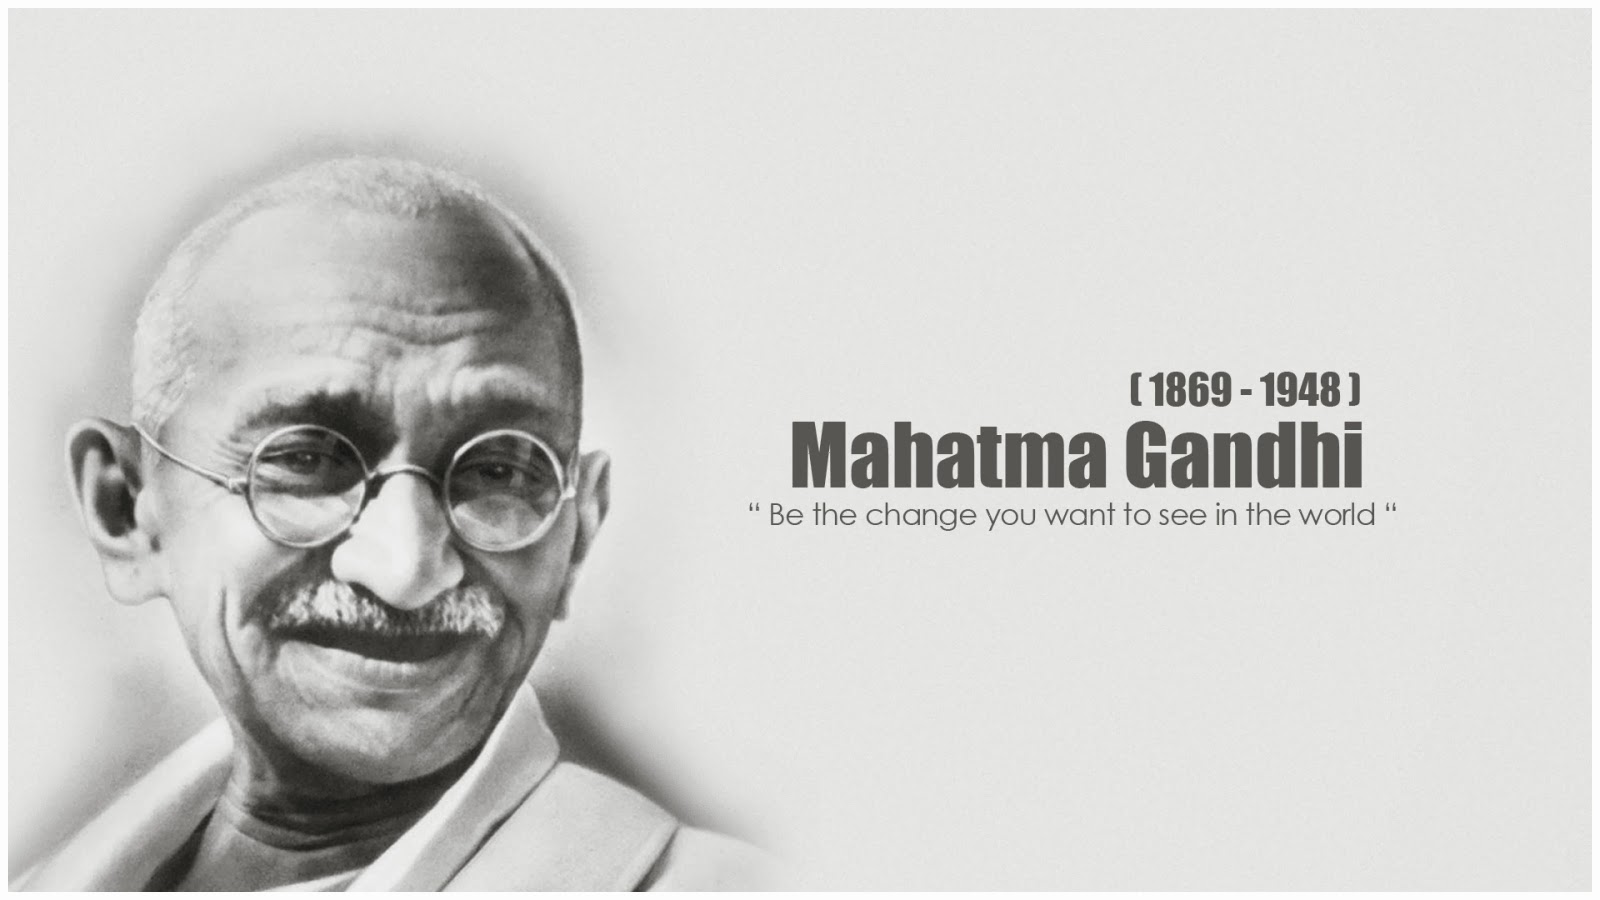 school project works a short essey about mahatma gandhi  mahatma gandhi 1869 1948